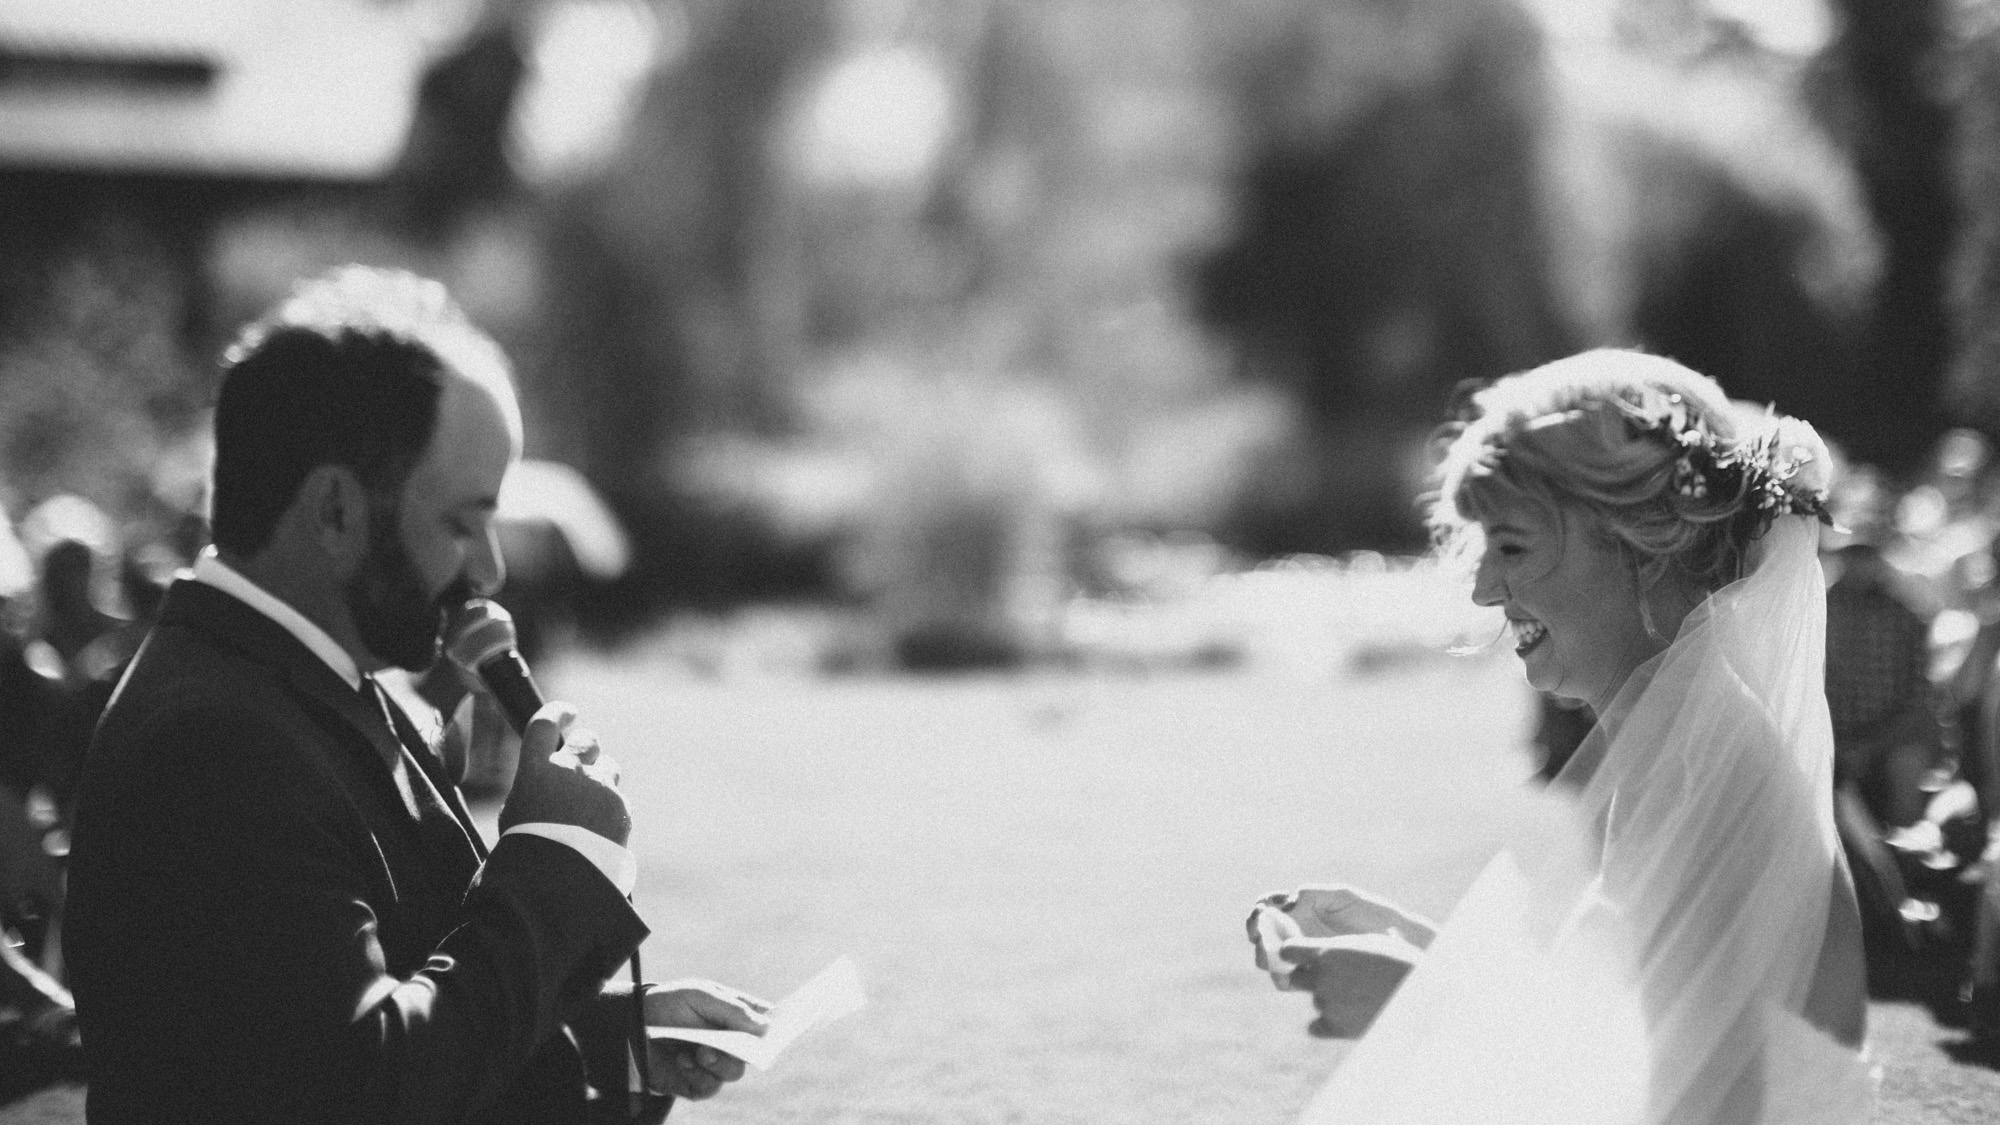 Montana_Wedding_Photos_alec_vanderboom-0093.jpg